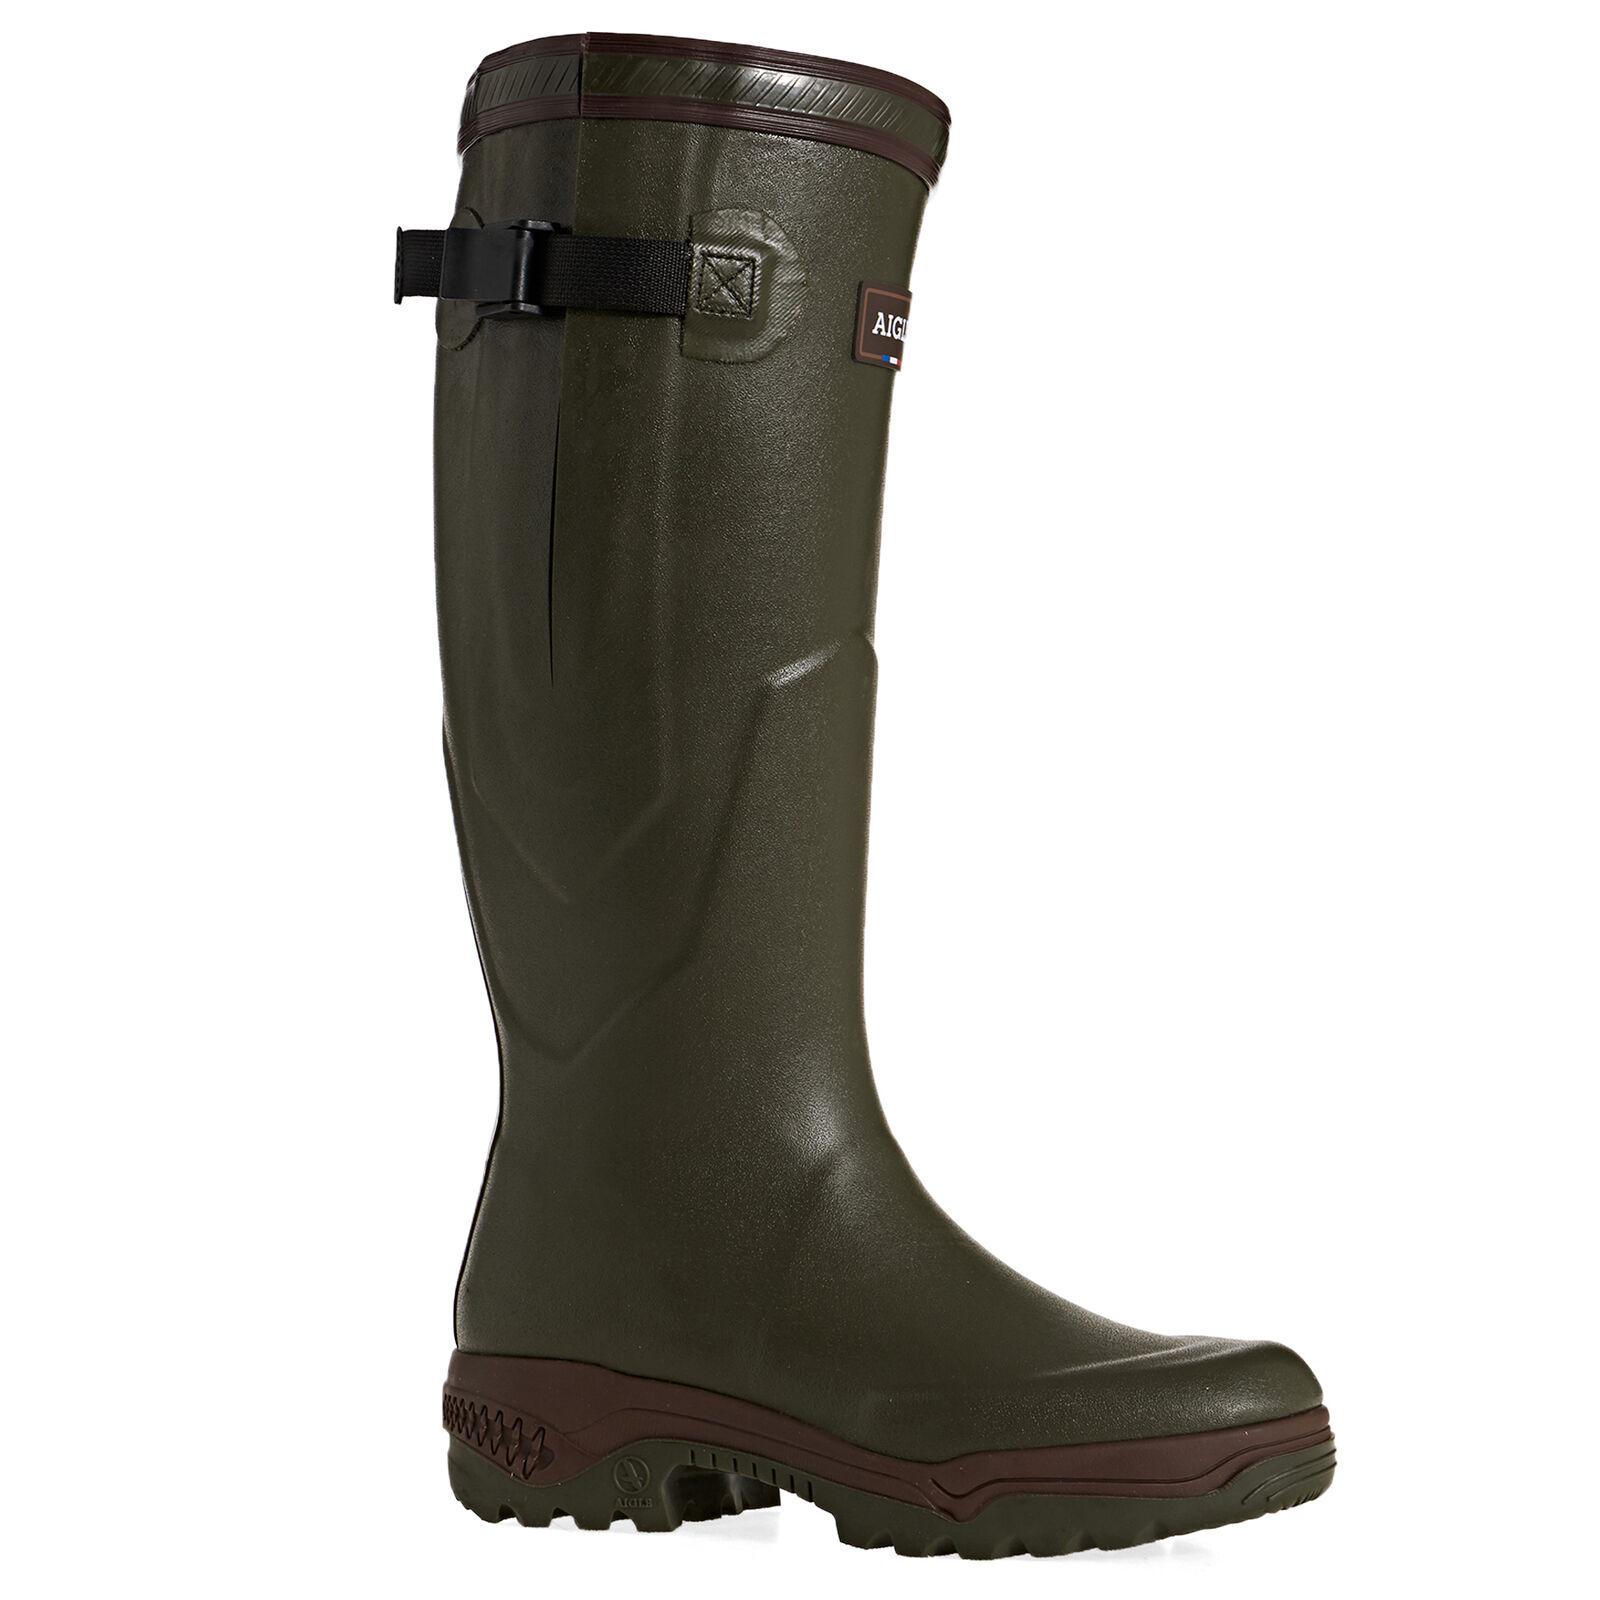 Aigle Parcours 2 Vario Mens Boots Wellington - Kaki All Sizes